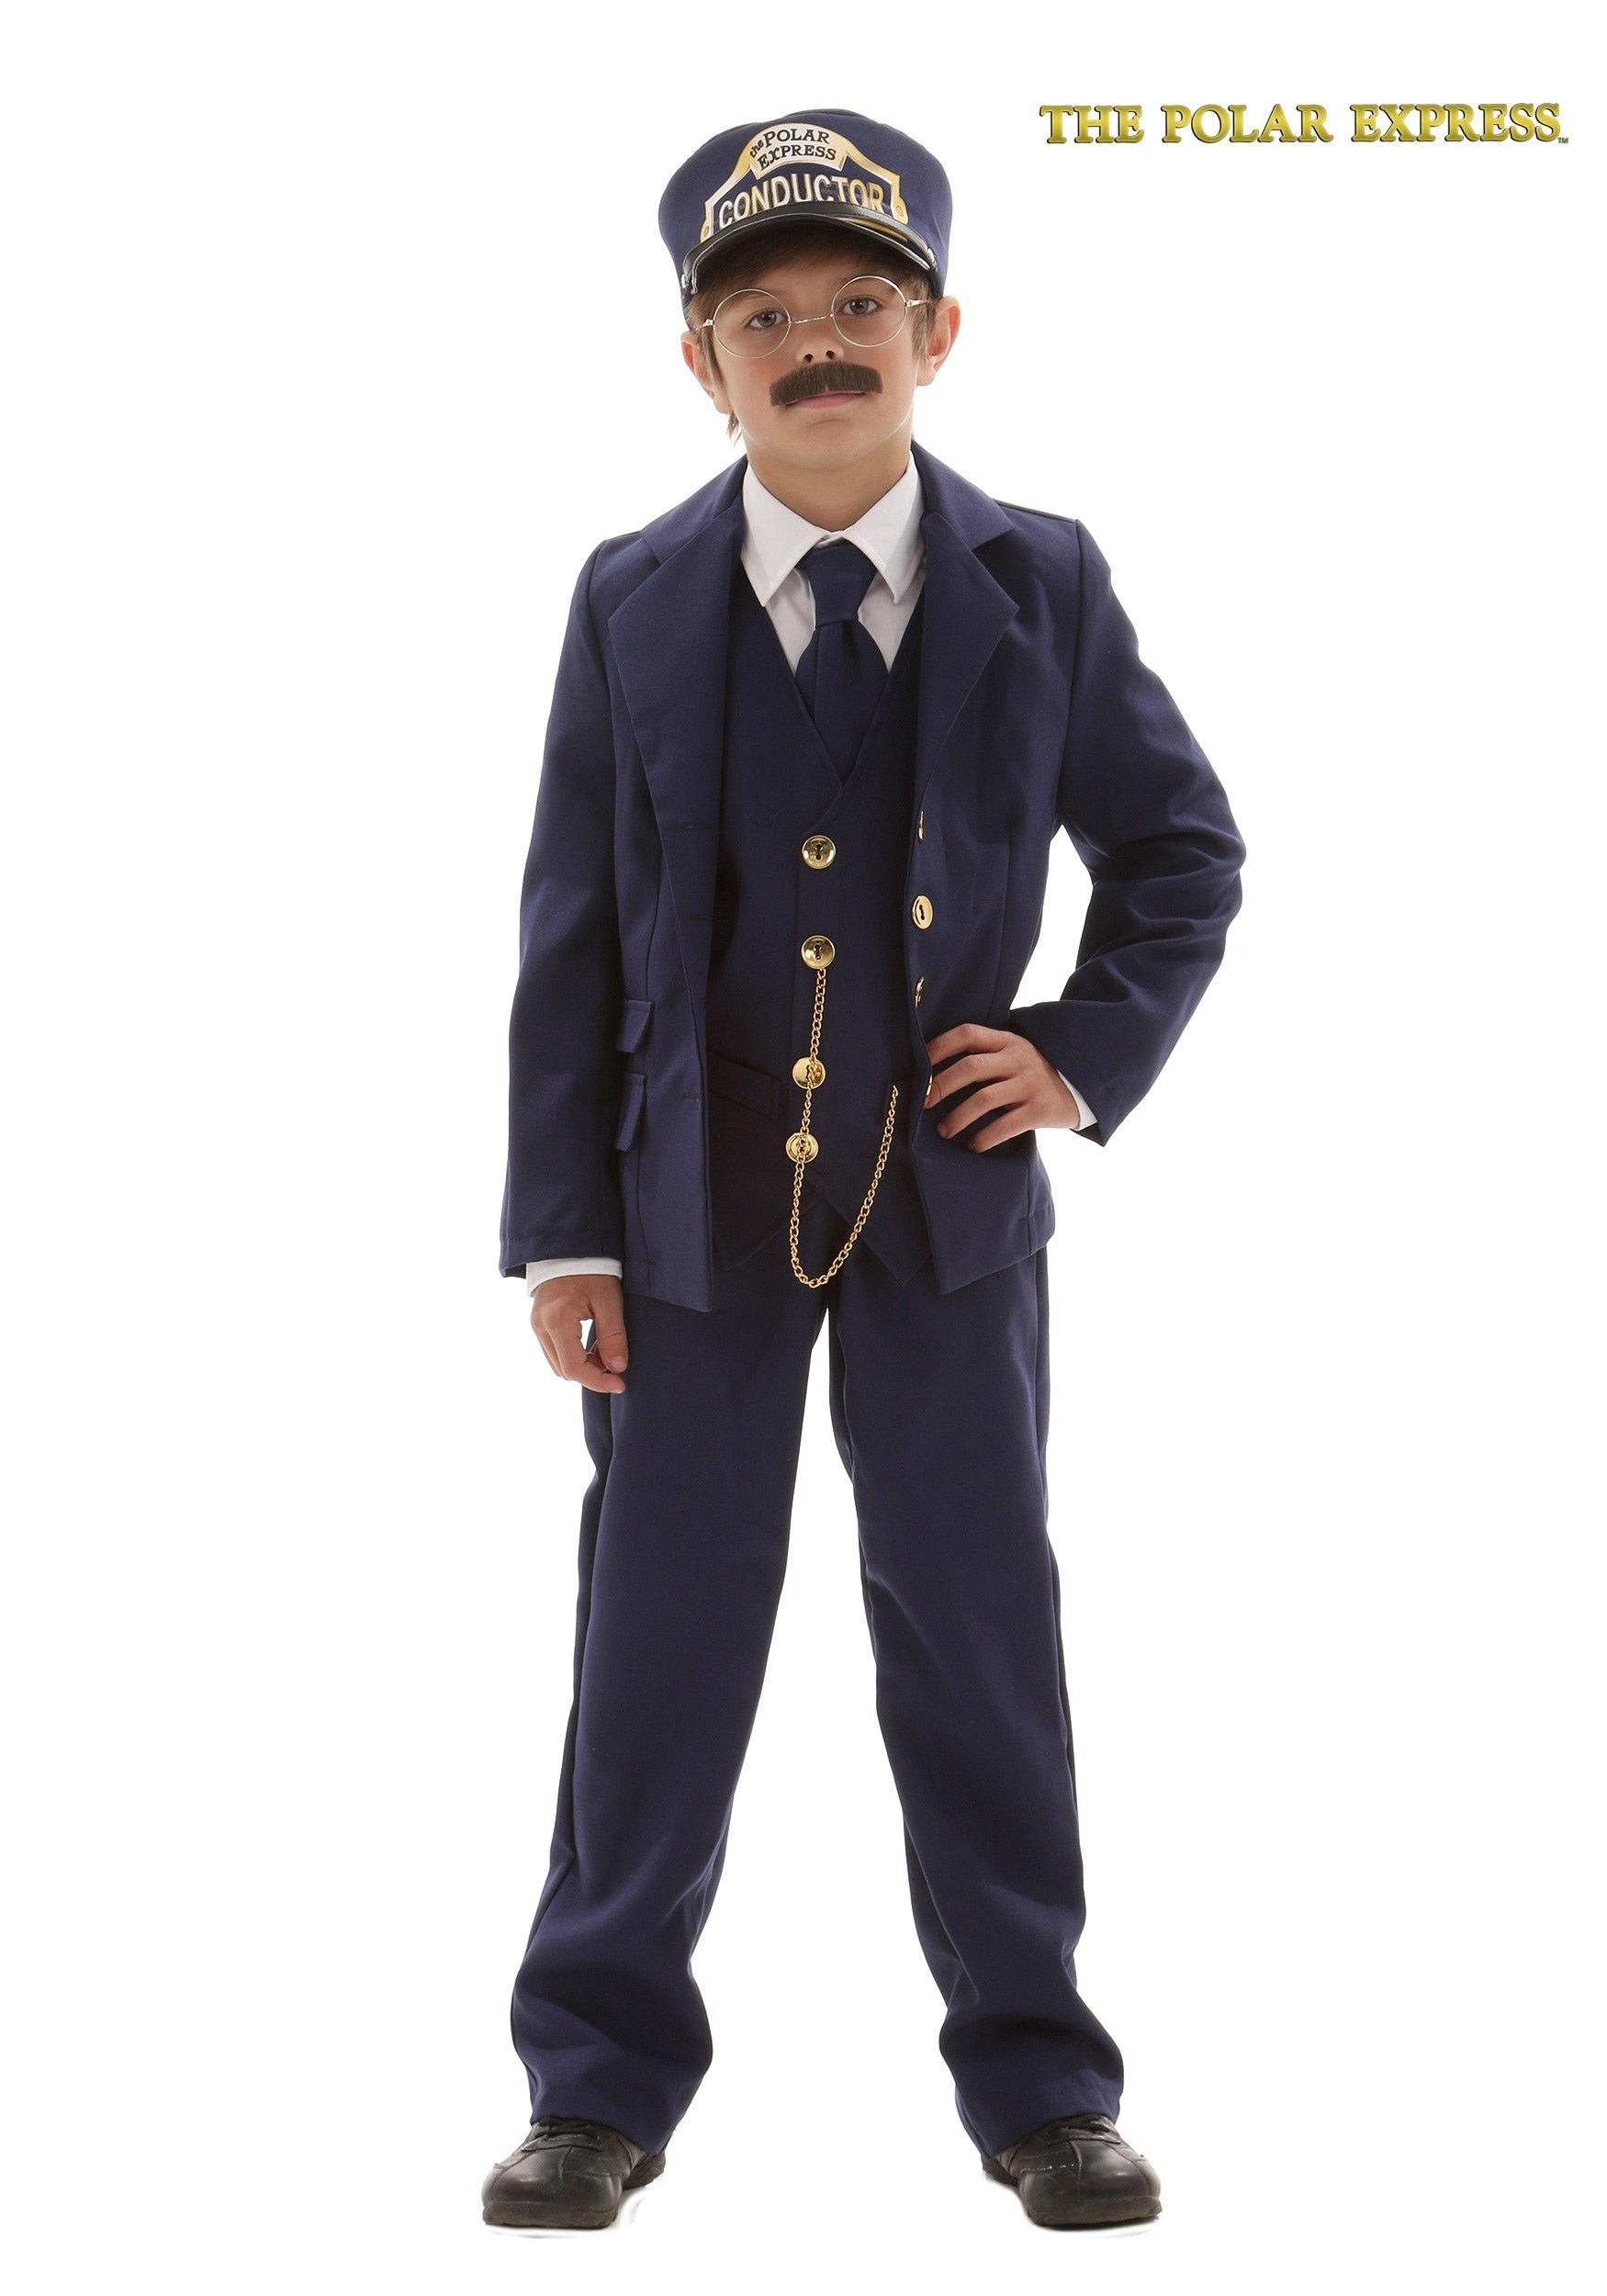 Child Polar Express Conductor  sc 1 st  Halloween Costumes & Child Polar Express Conductor Costume